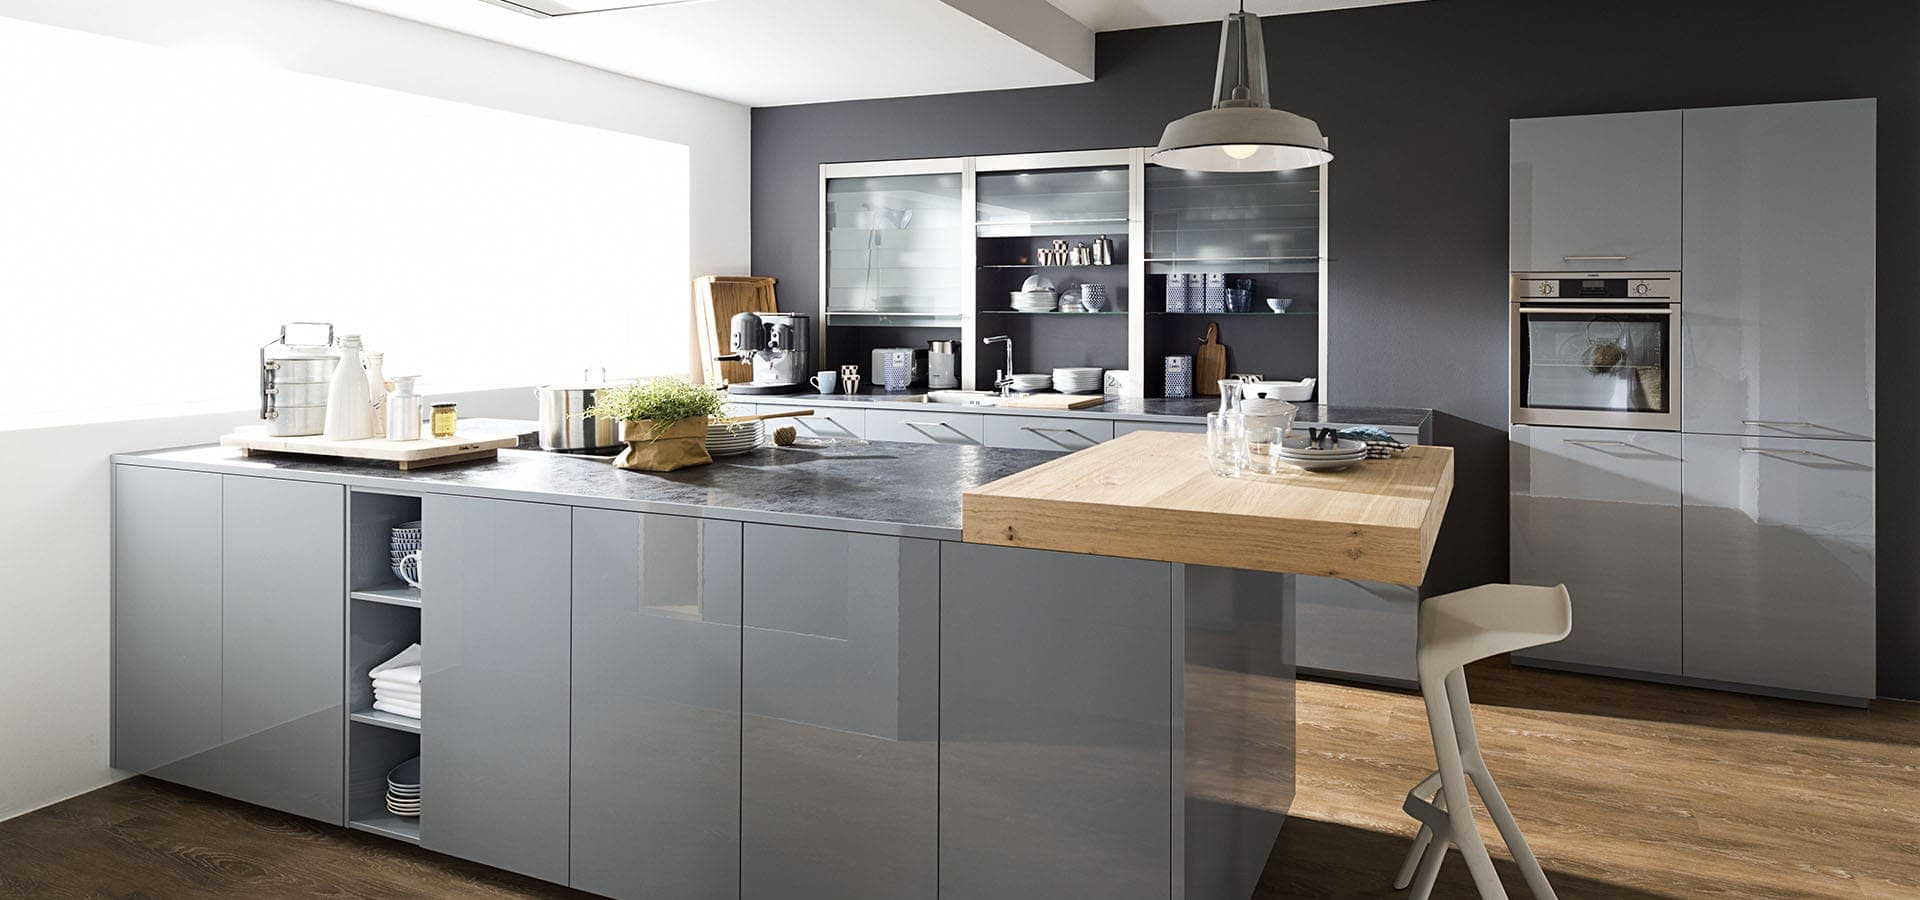 Emejing Nolte Küchen Katalog 2013 Images - Ideas & Design ...